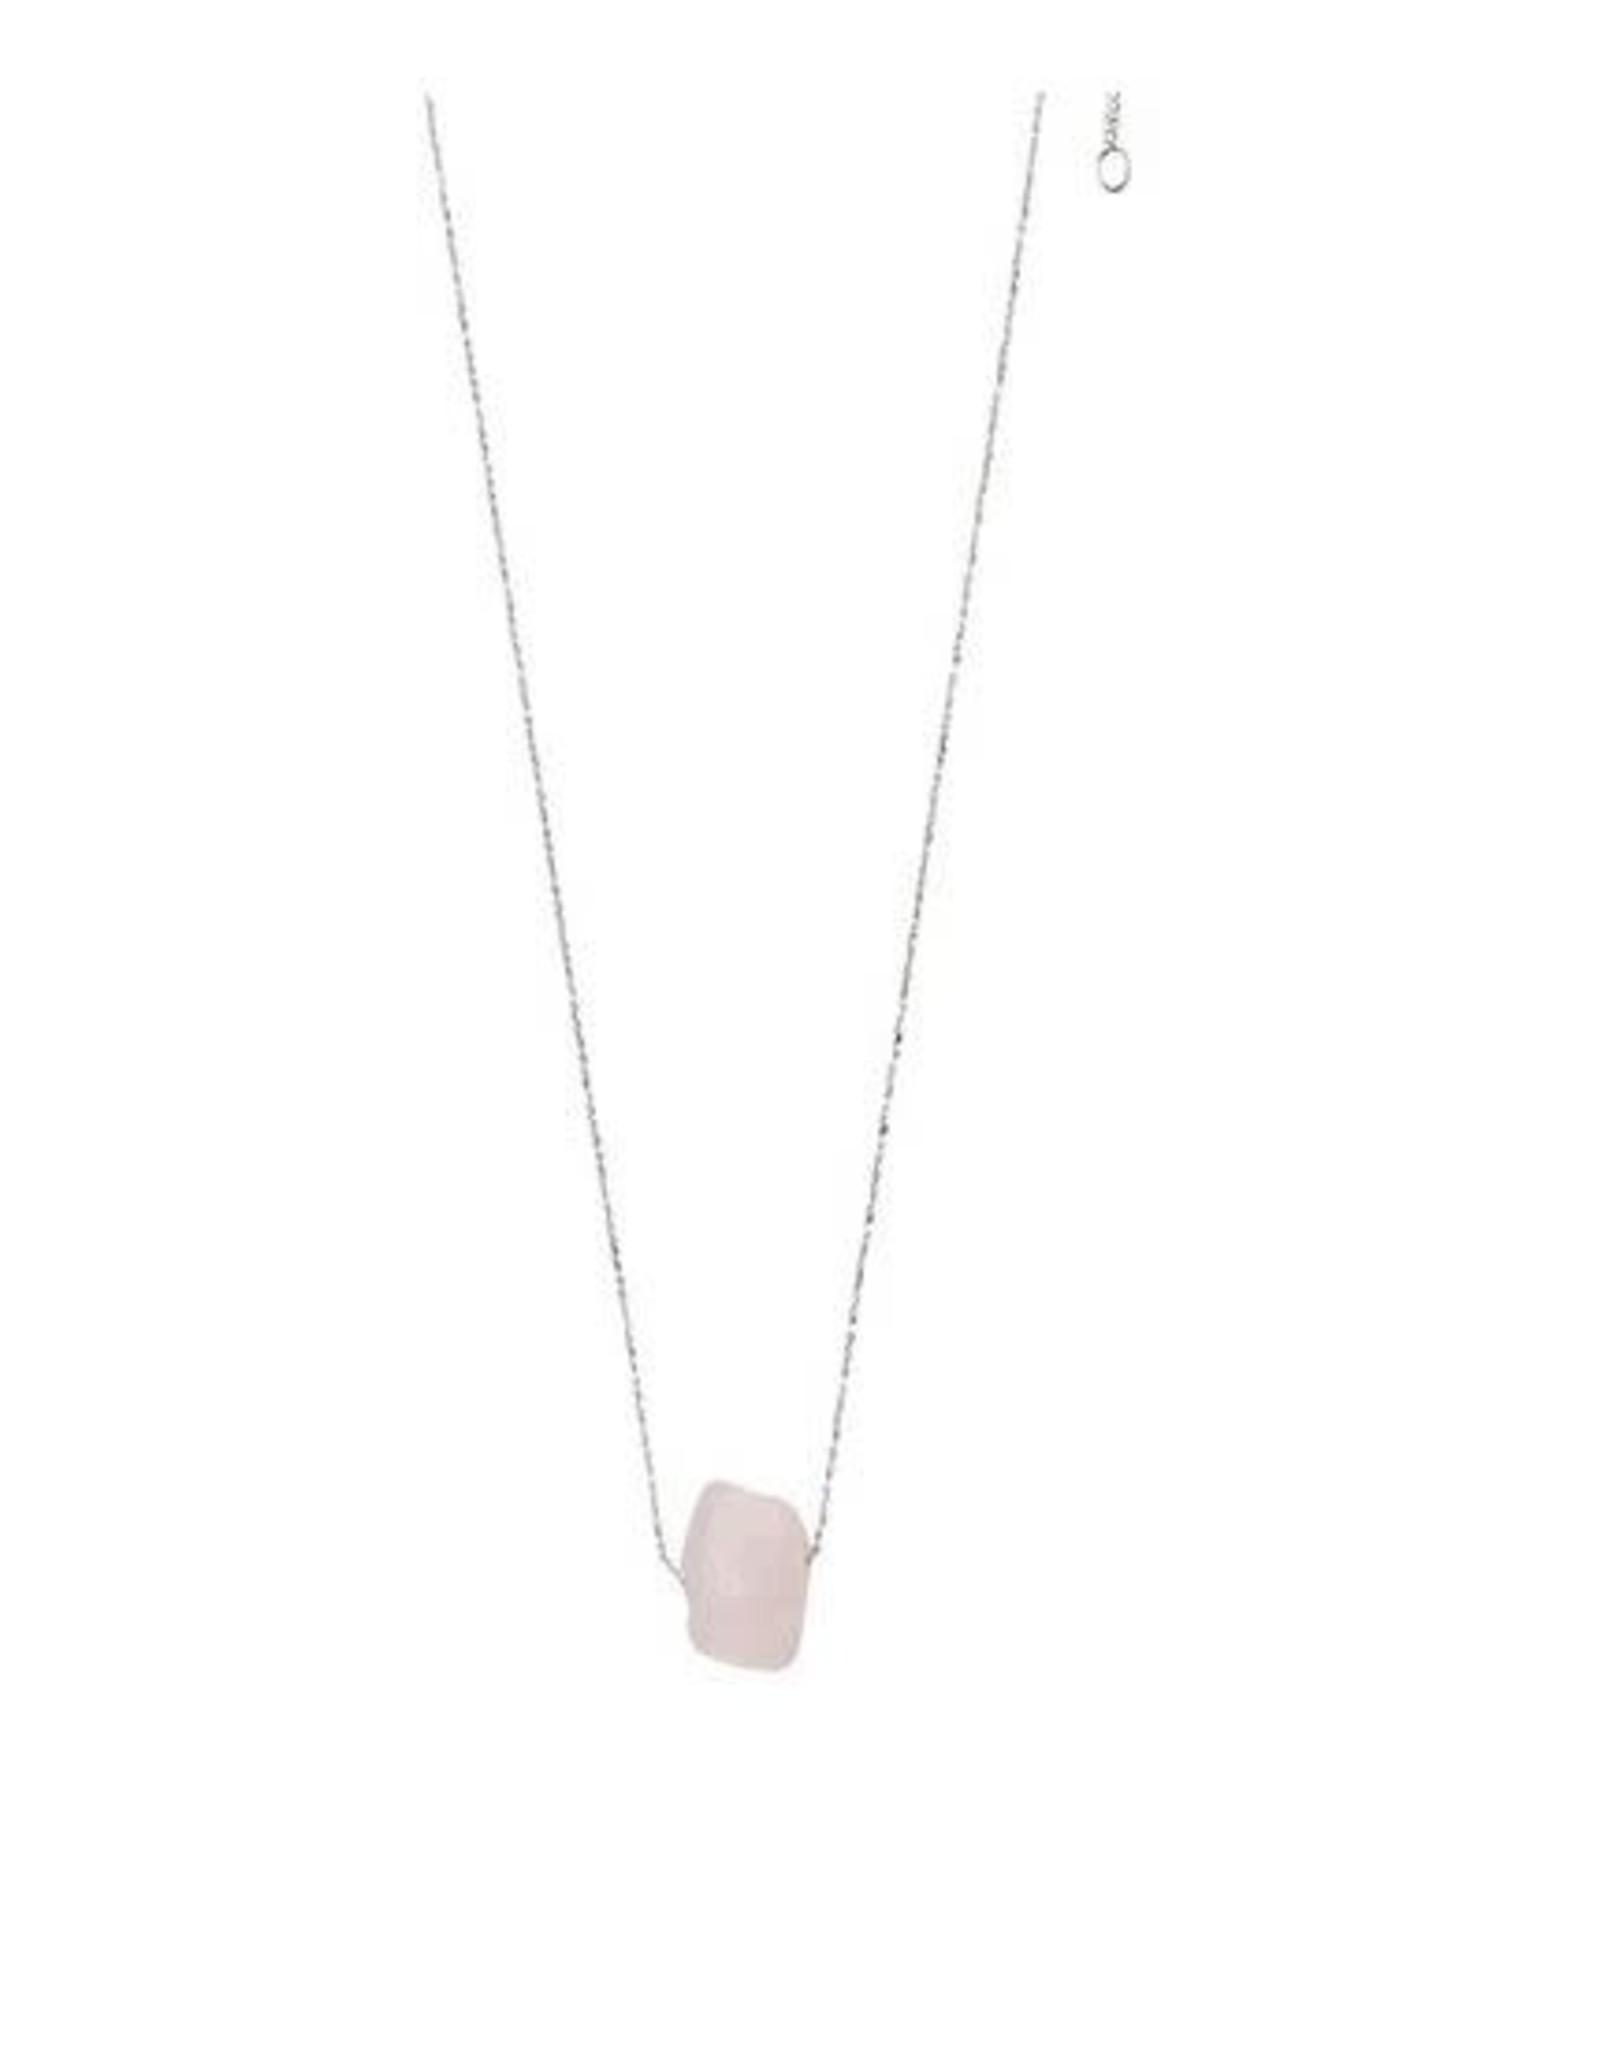 Pilgrim Heart Chakra Necklace - Rose Quartz